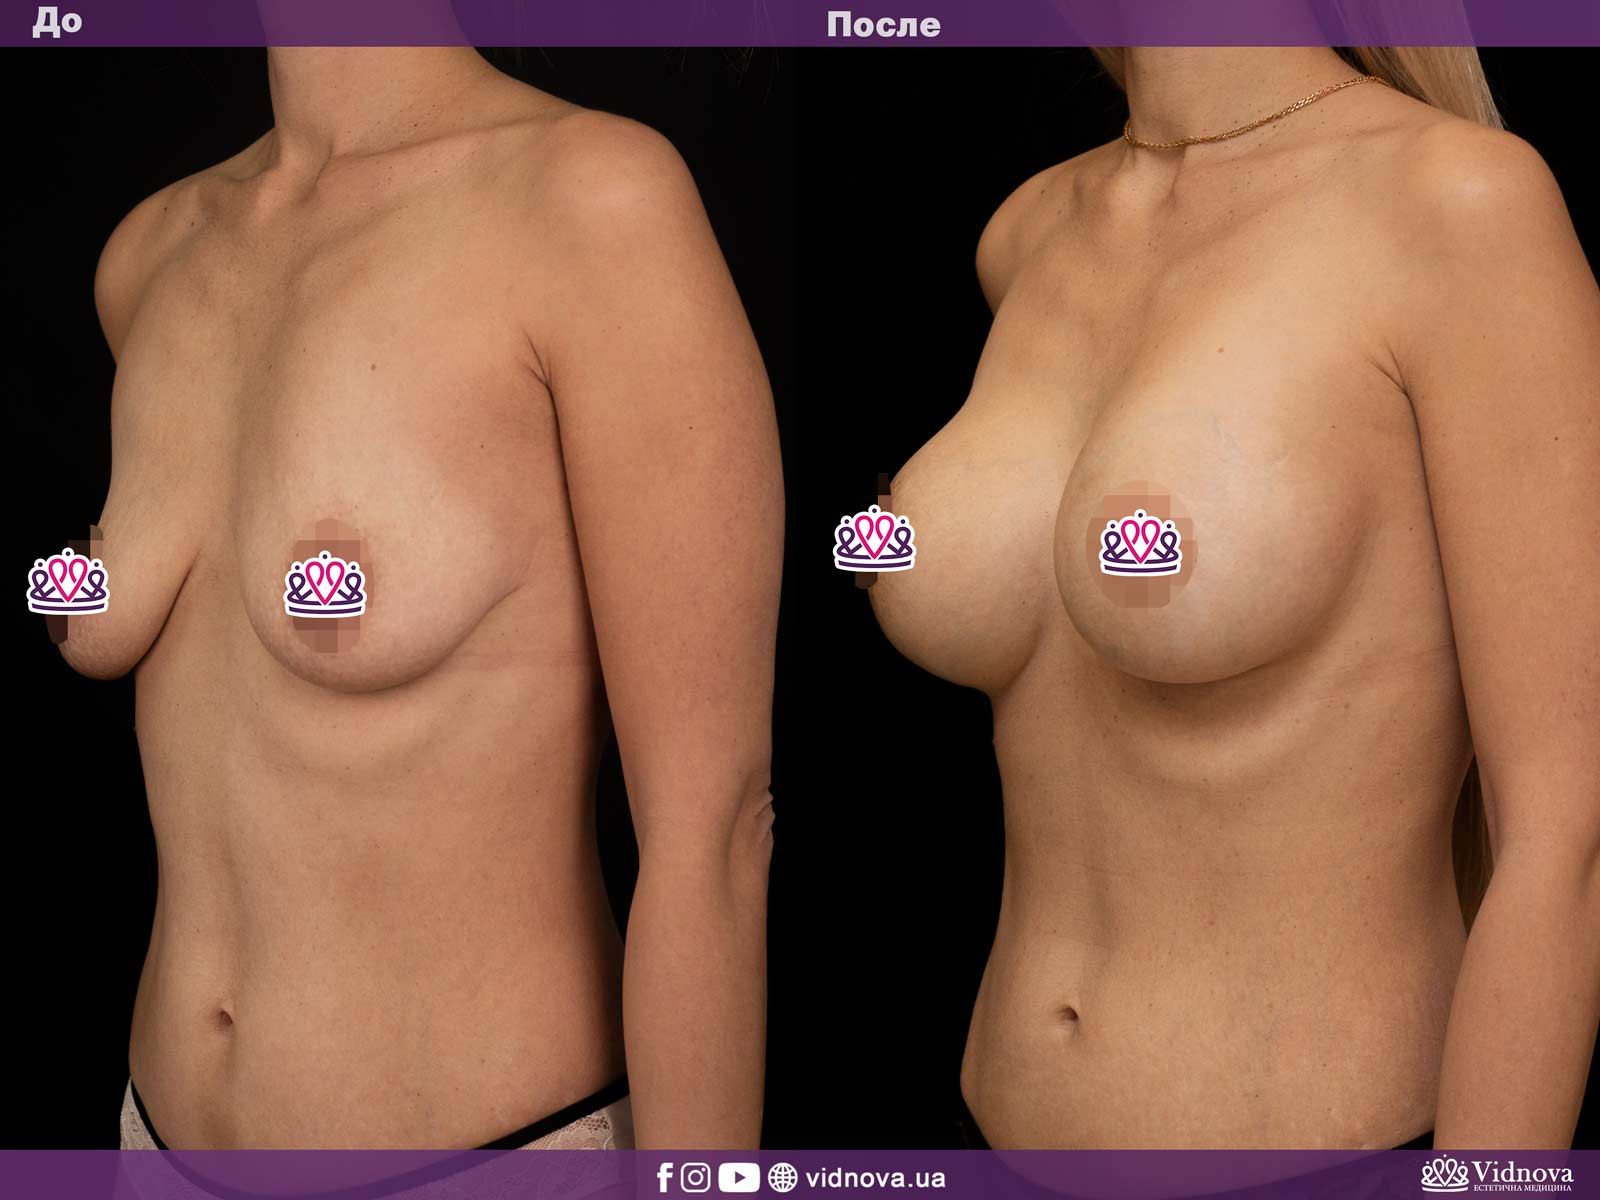 Подтяжка груди: Фото ДО и ПОСЛЕ - Пример №2-2 - Клиника Vidnova